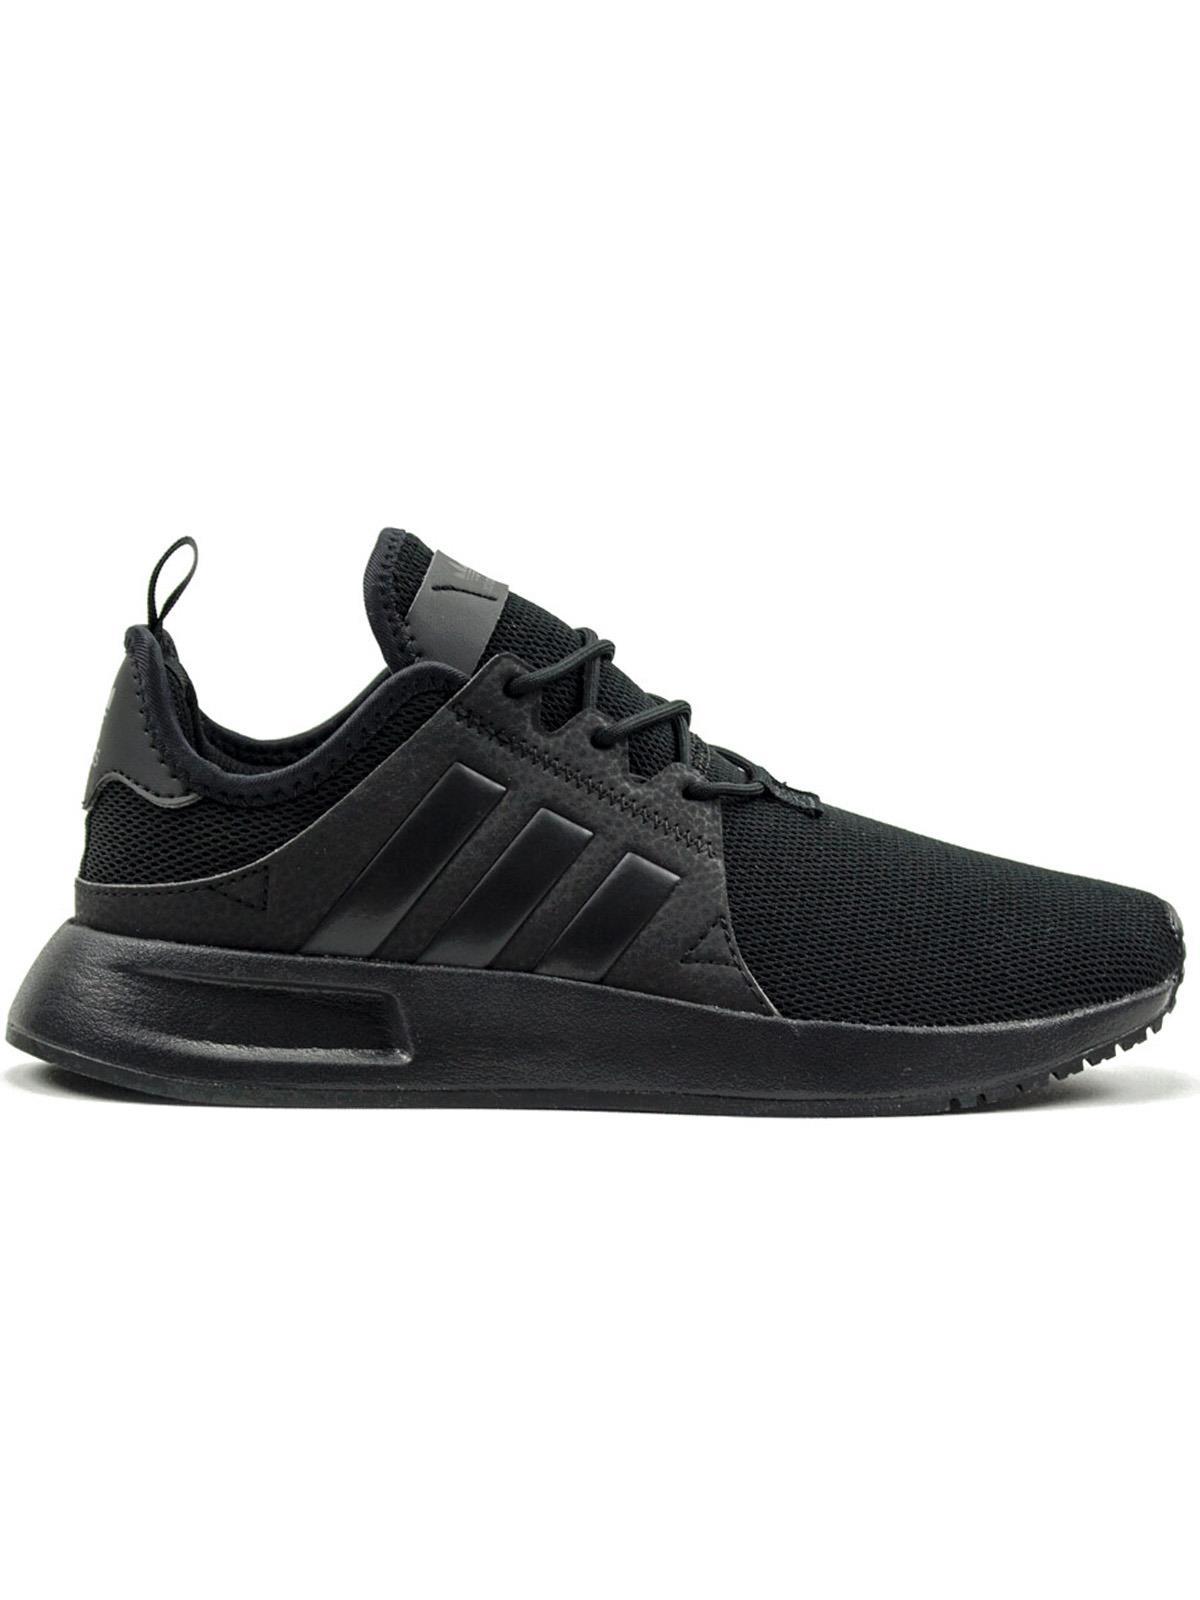 ADIDAS XPLR J Sneaker Ragazzo BY9879